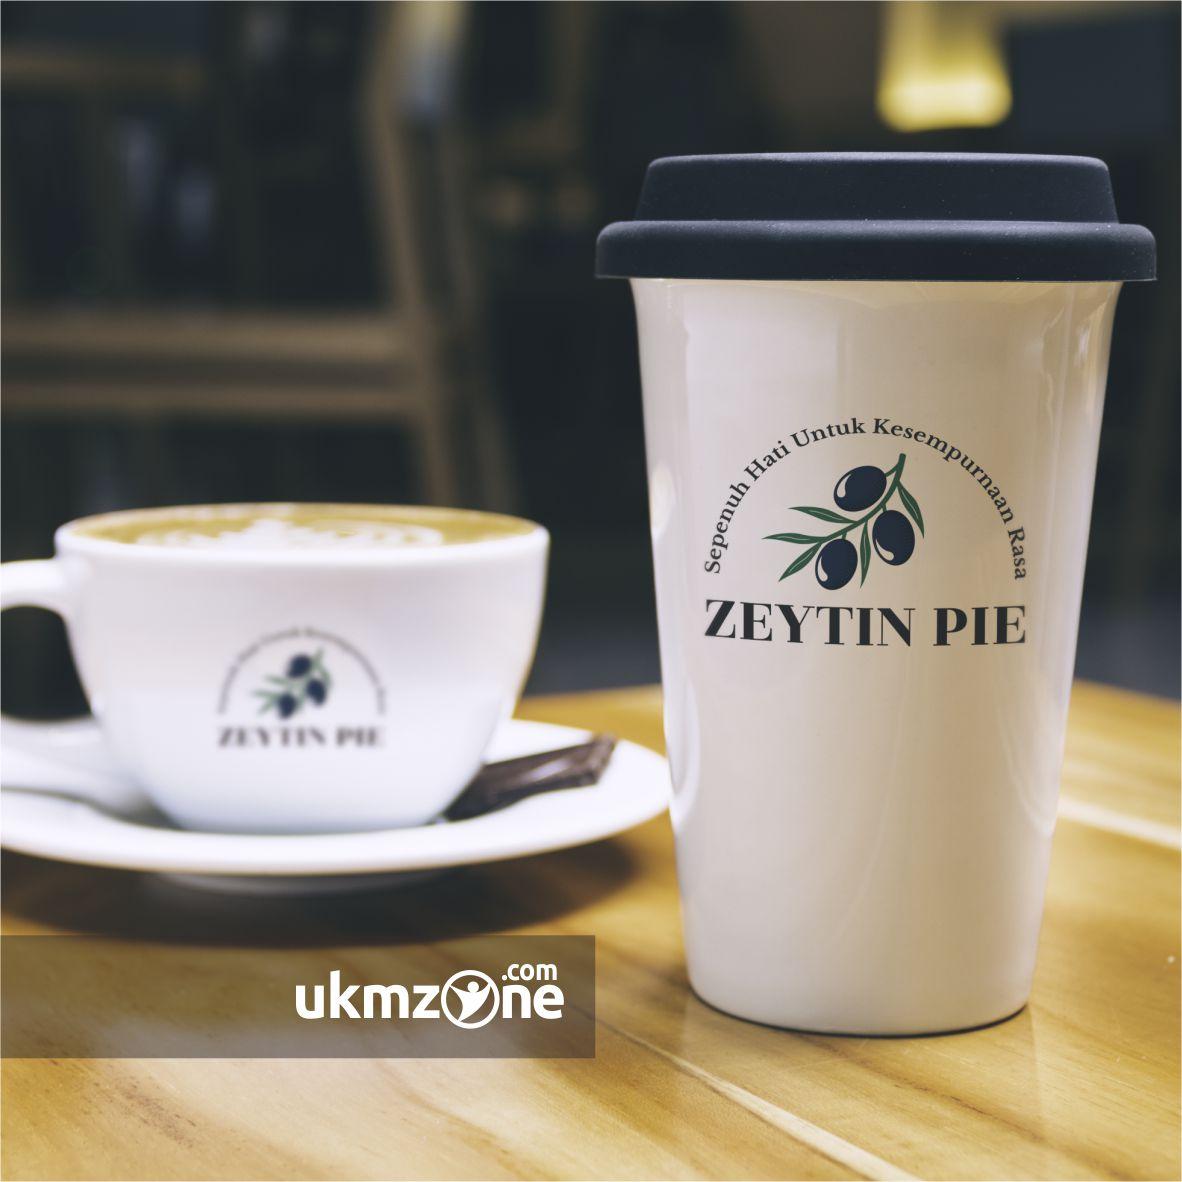 Redesain logo Zeytin desain ulang logo UKM kuliner Zeytin Pie UMKM IKM Depok - UKM ZONE